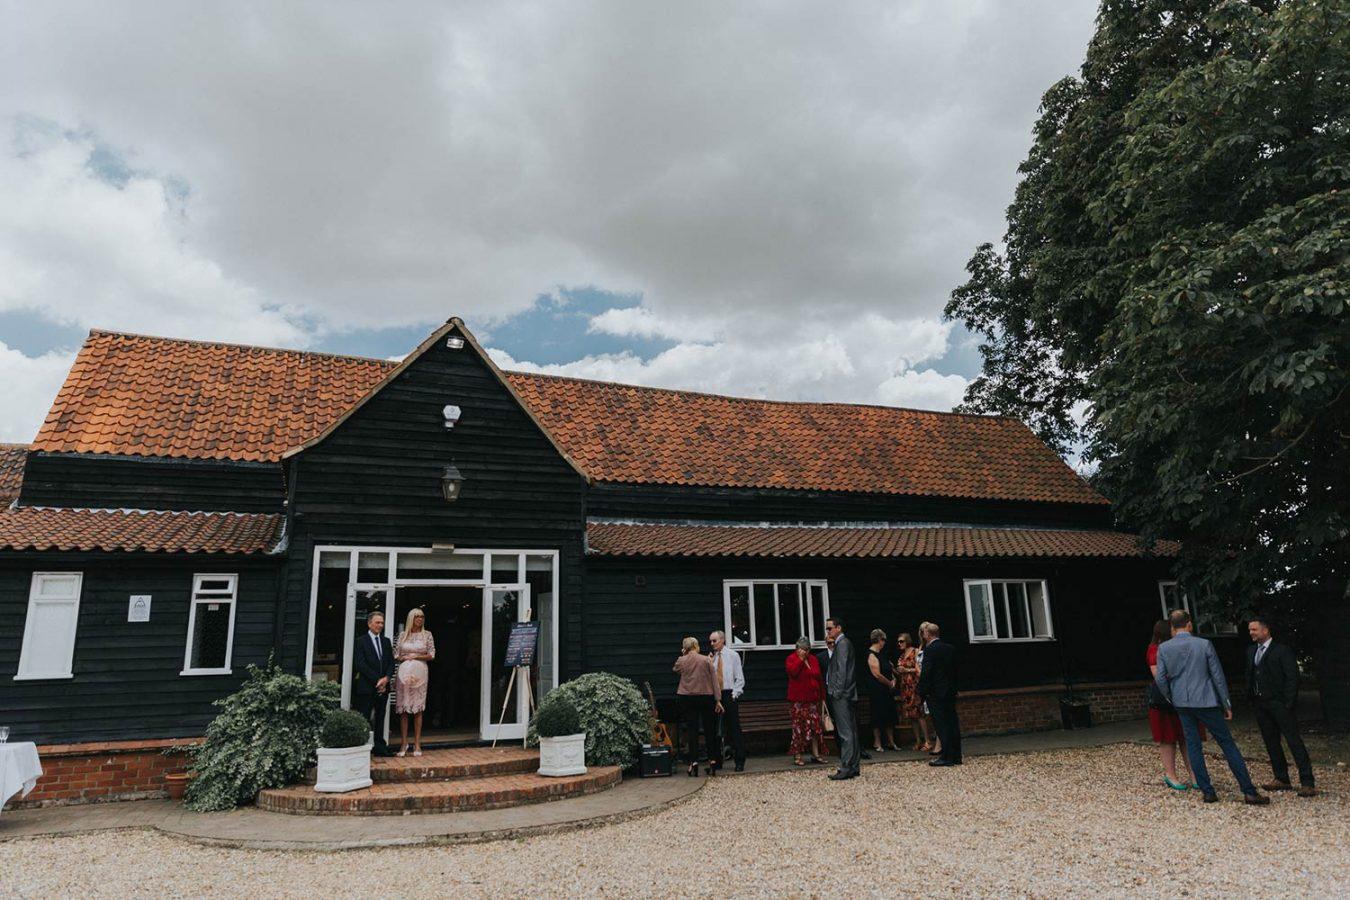 vaulty-manor-wedding-photography-079